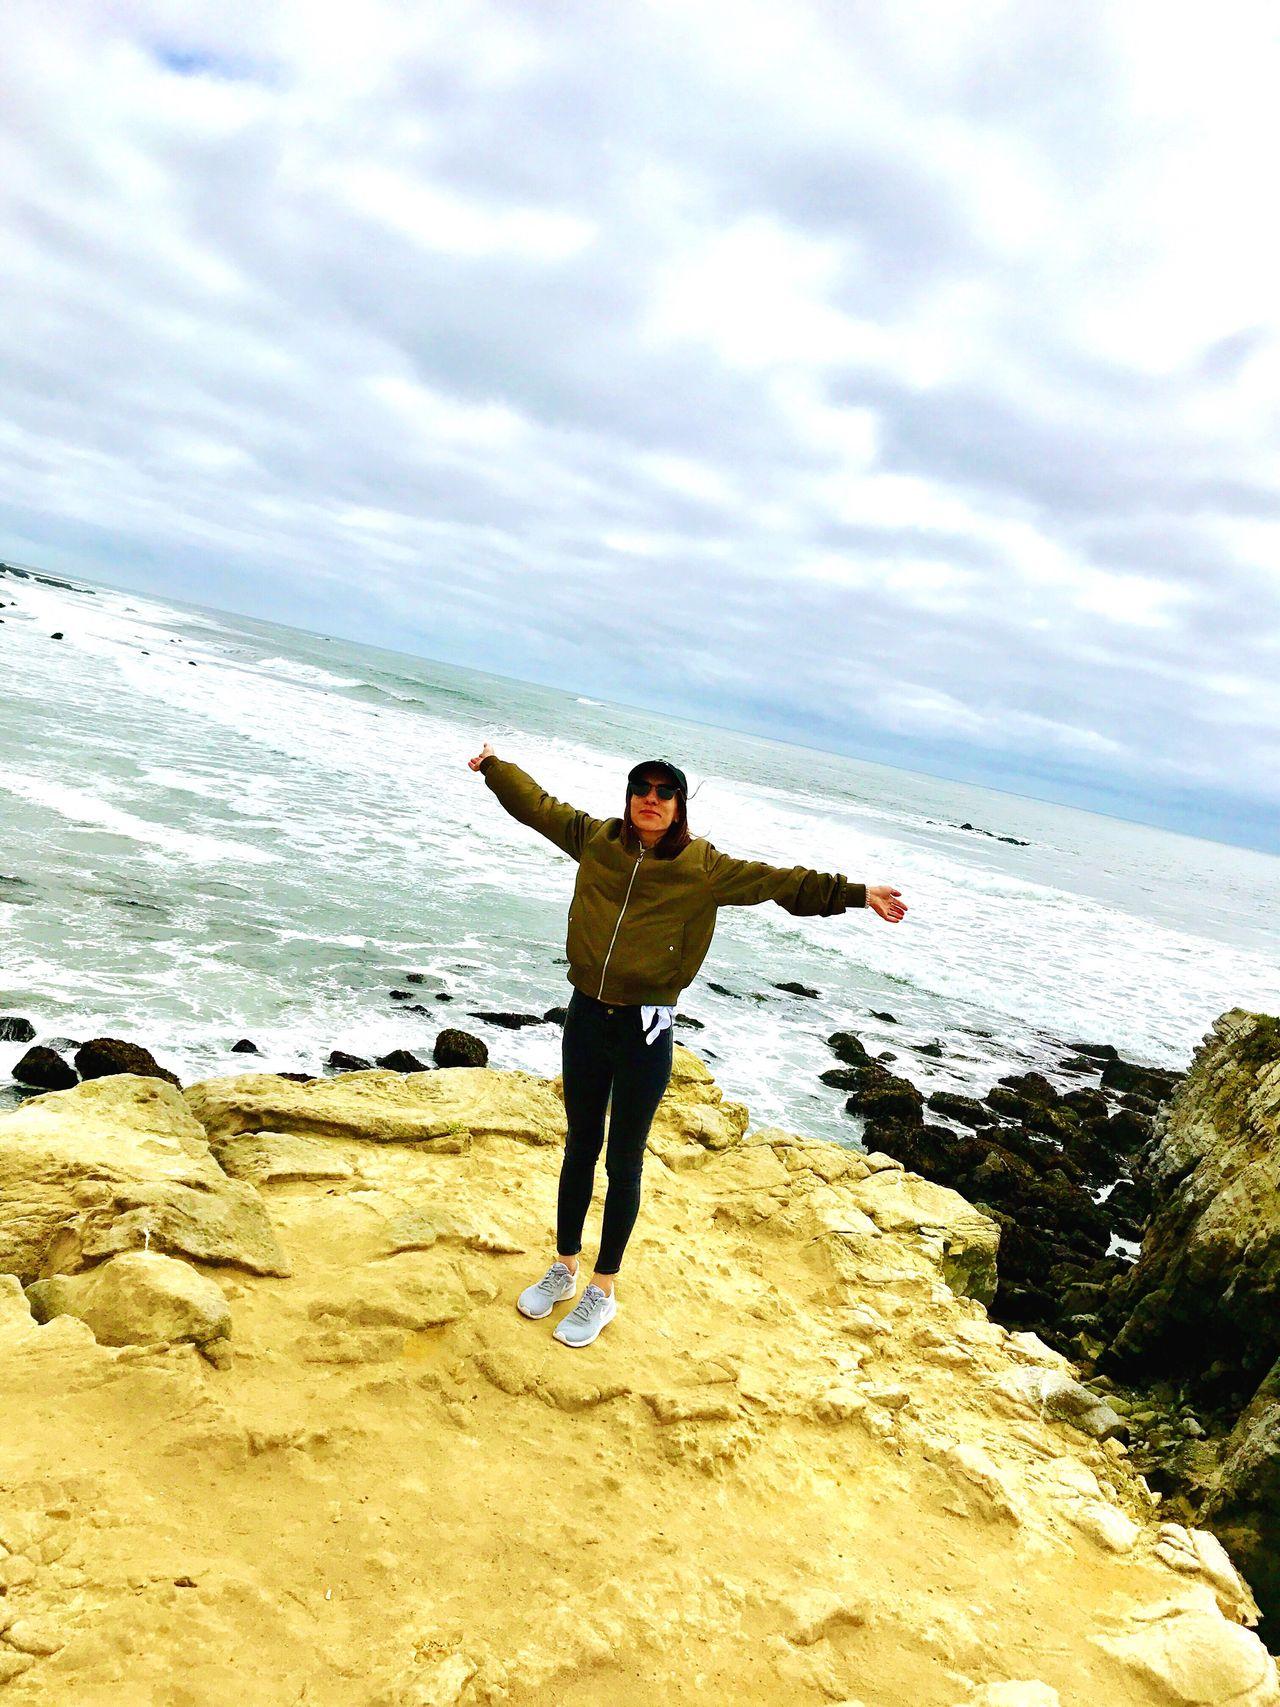 Beach Water Nature Lifestyles First Eyeem Photo The Great Outdoors - 2017 EyeEm Awards